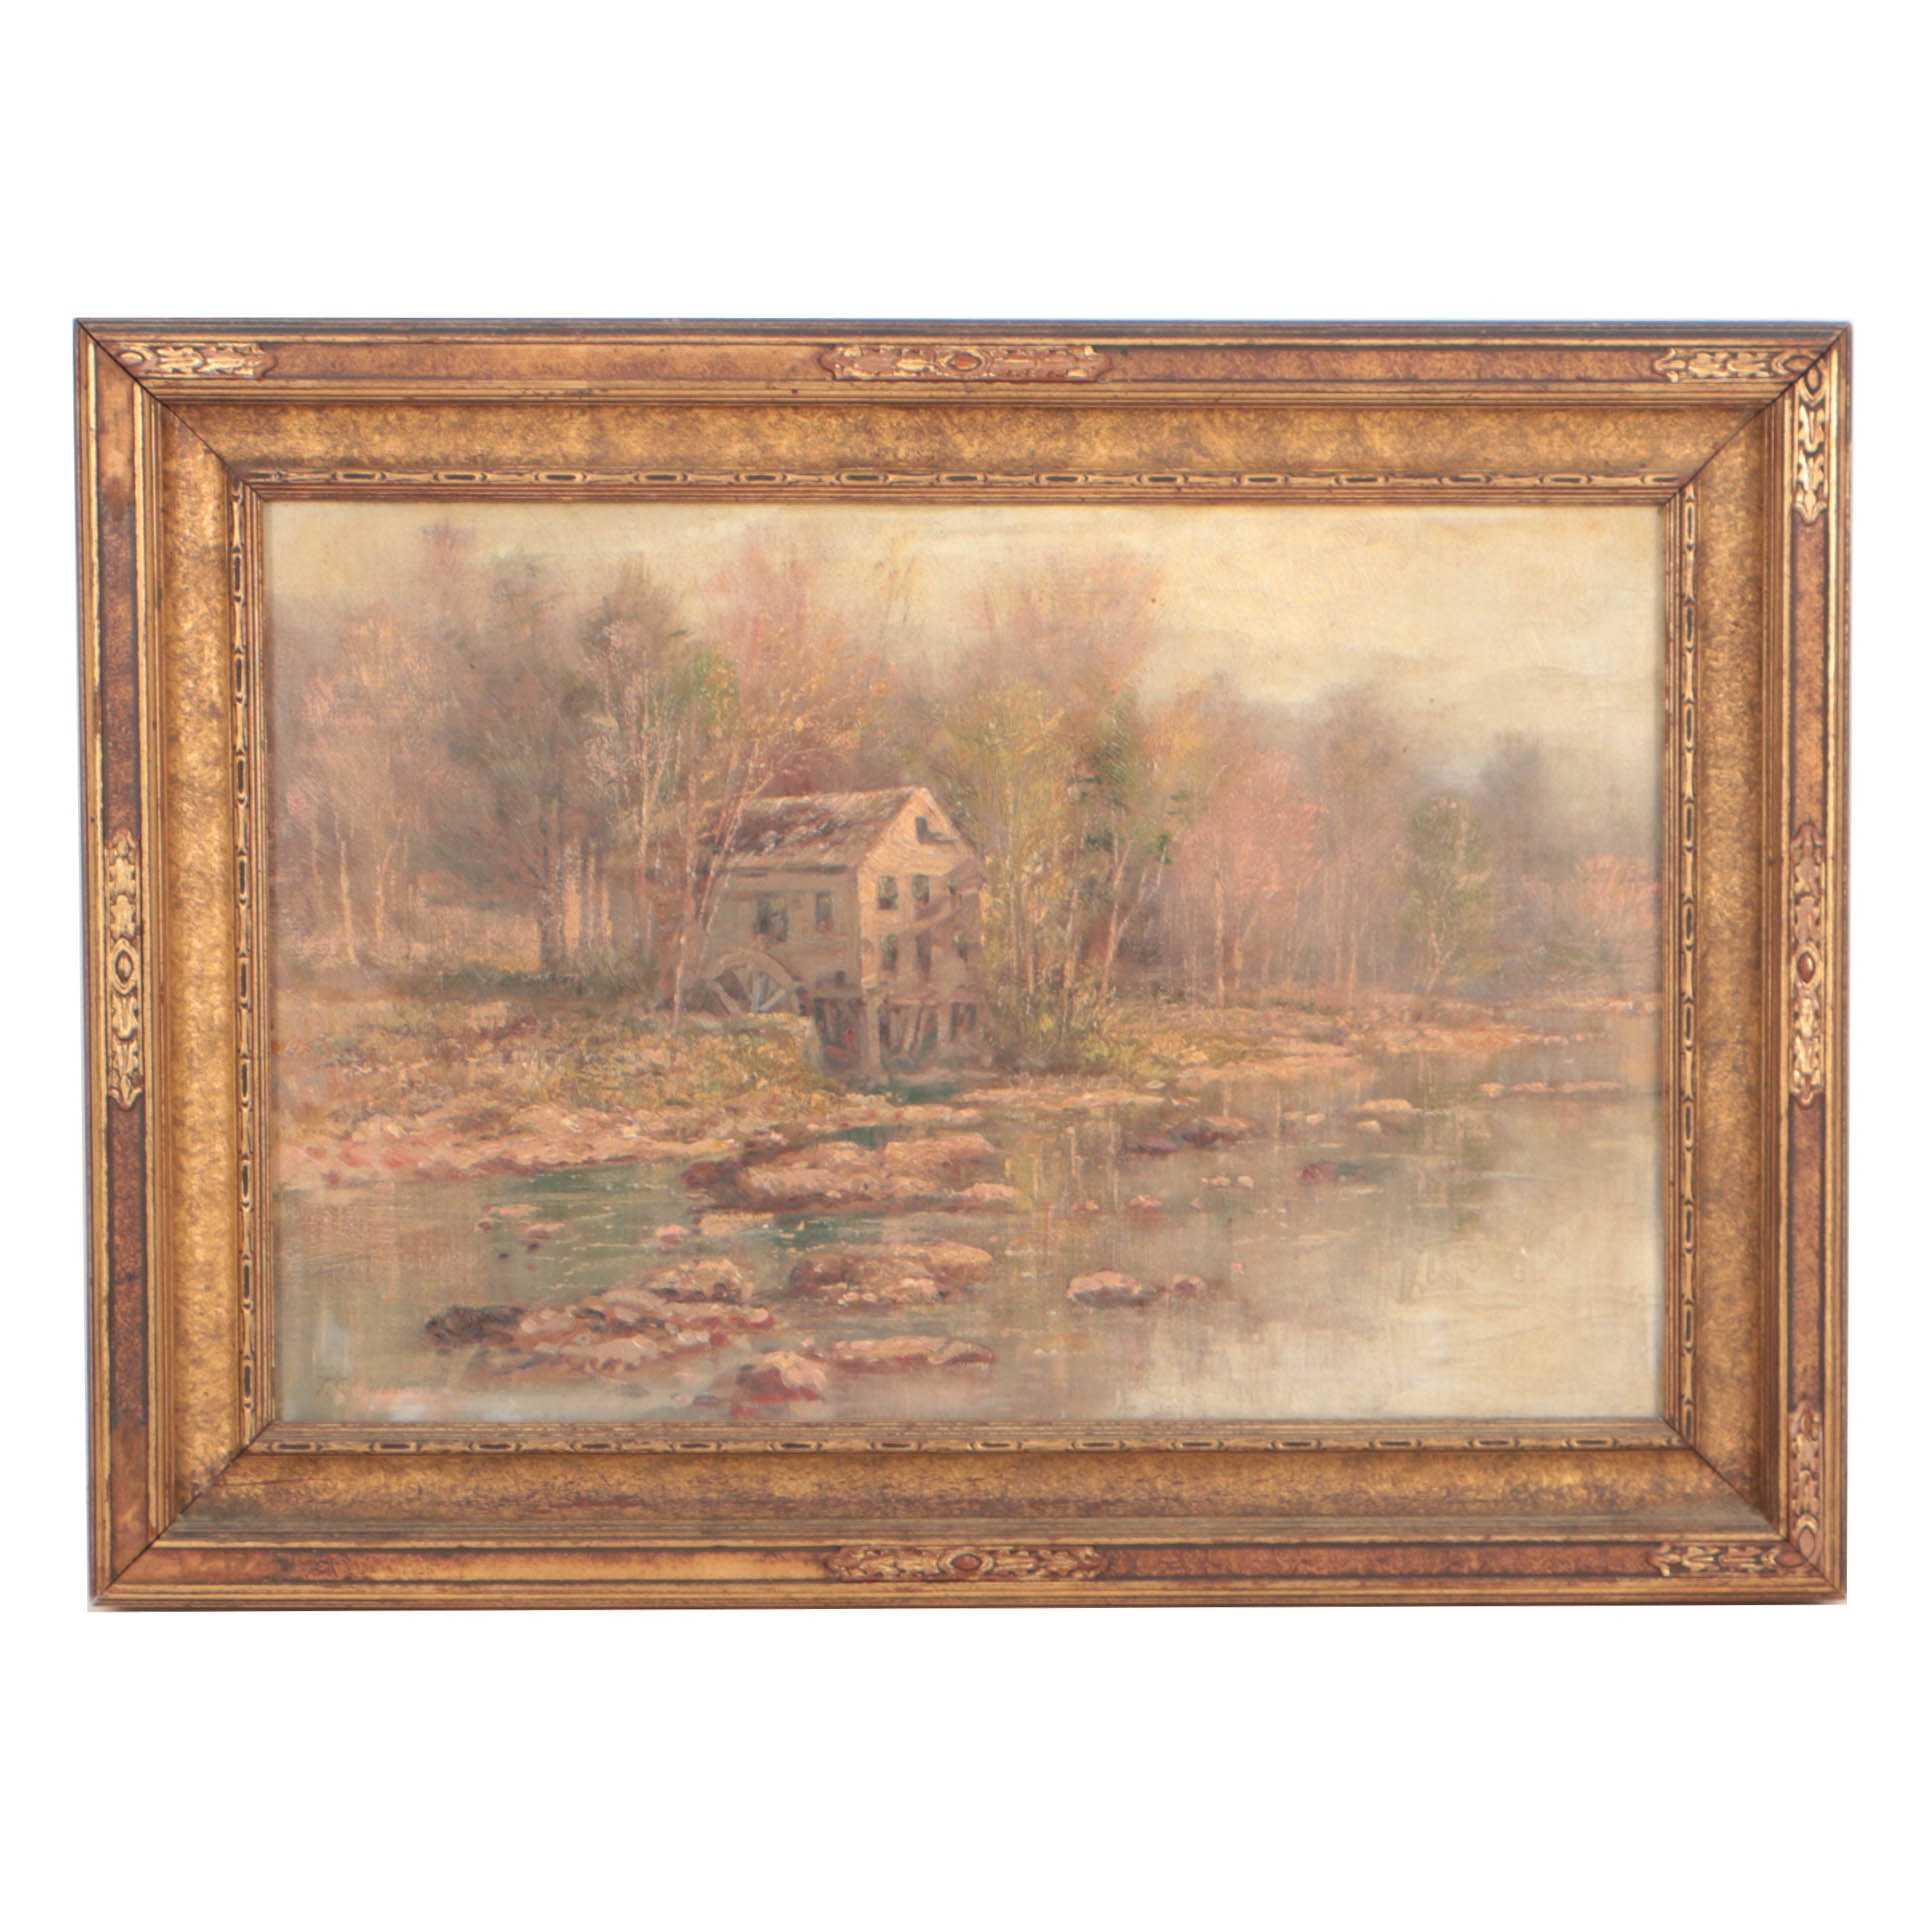 Thomas Corwin Lindsay Autumnal Landscape Oil Painting